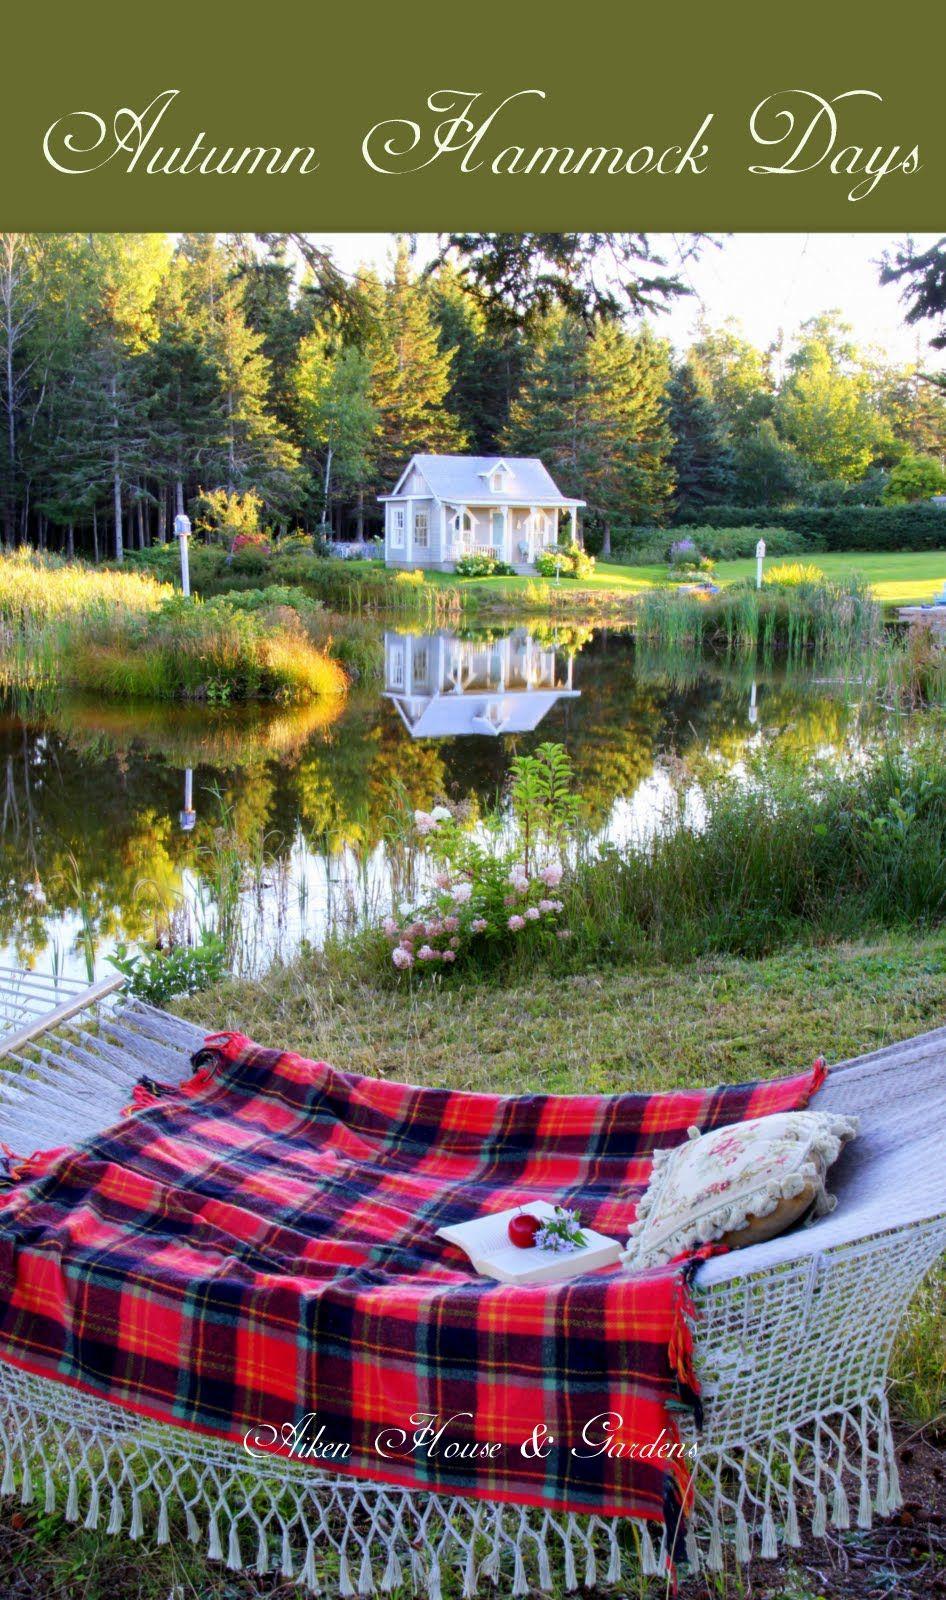 Aiken house u gardens autumn days in a hammock new pool area